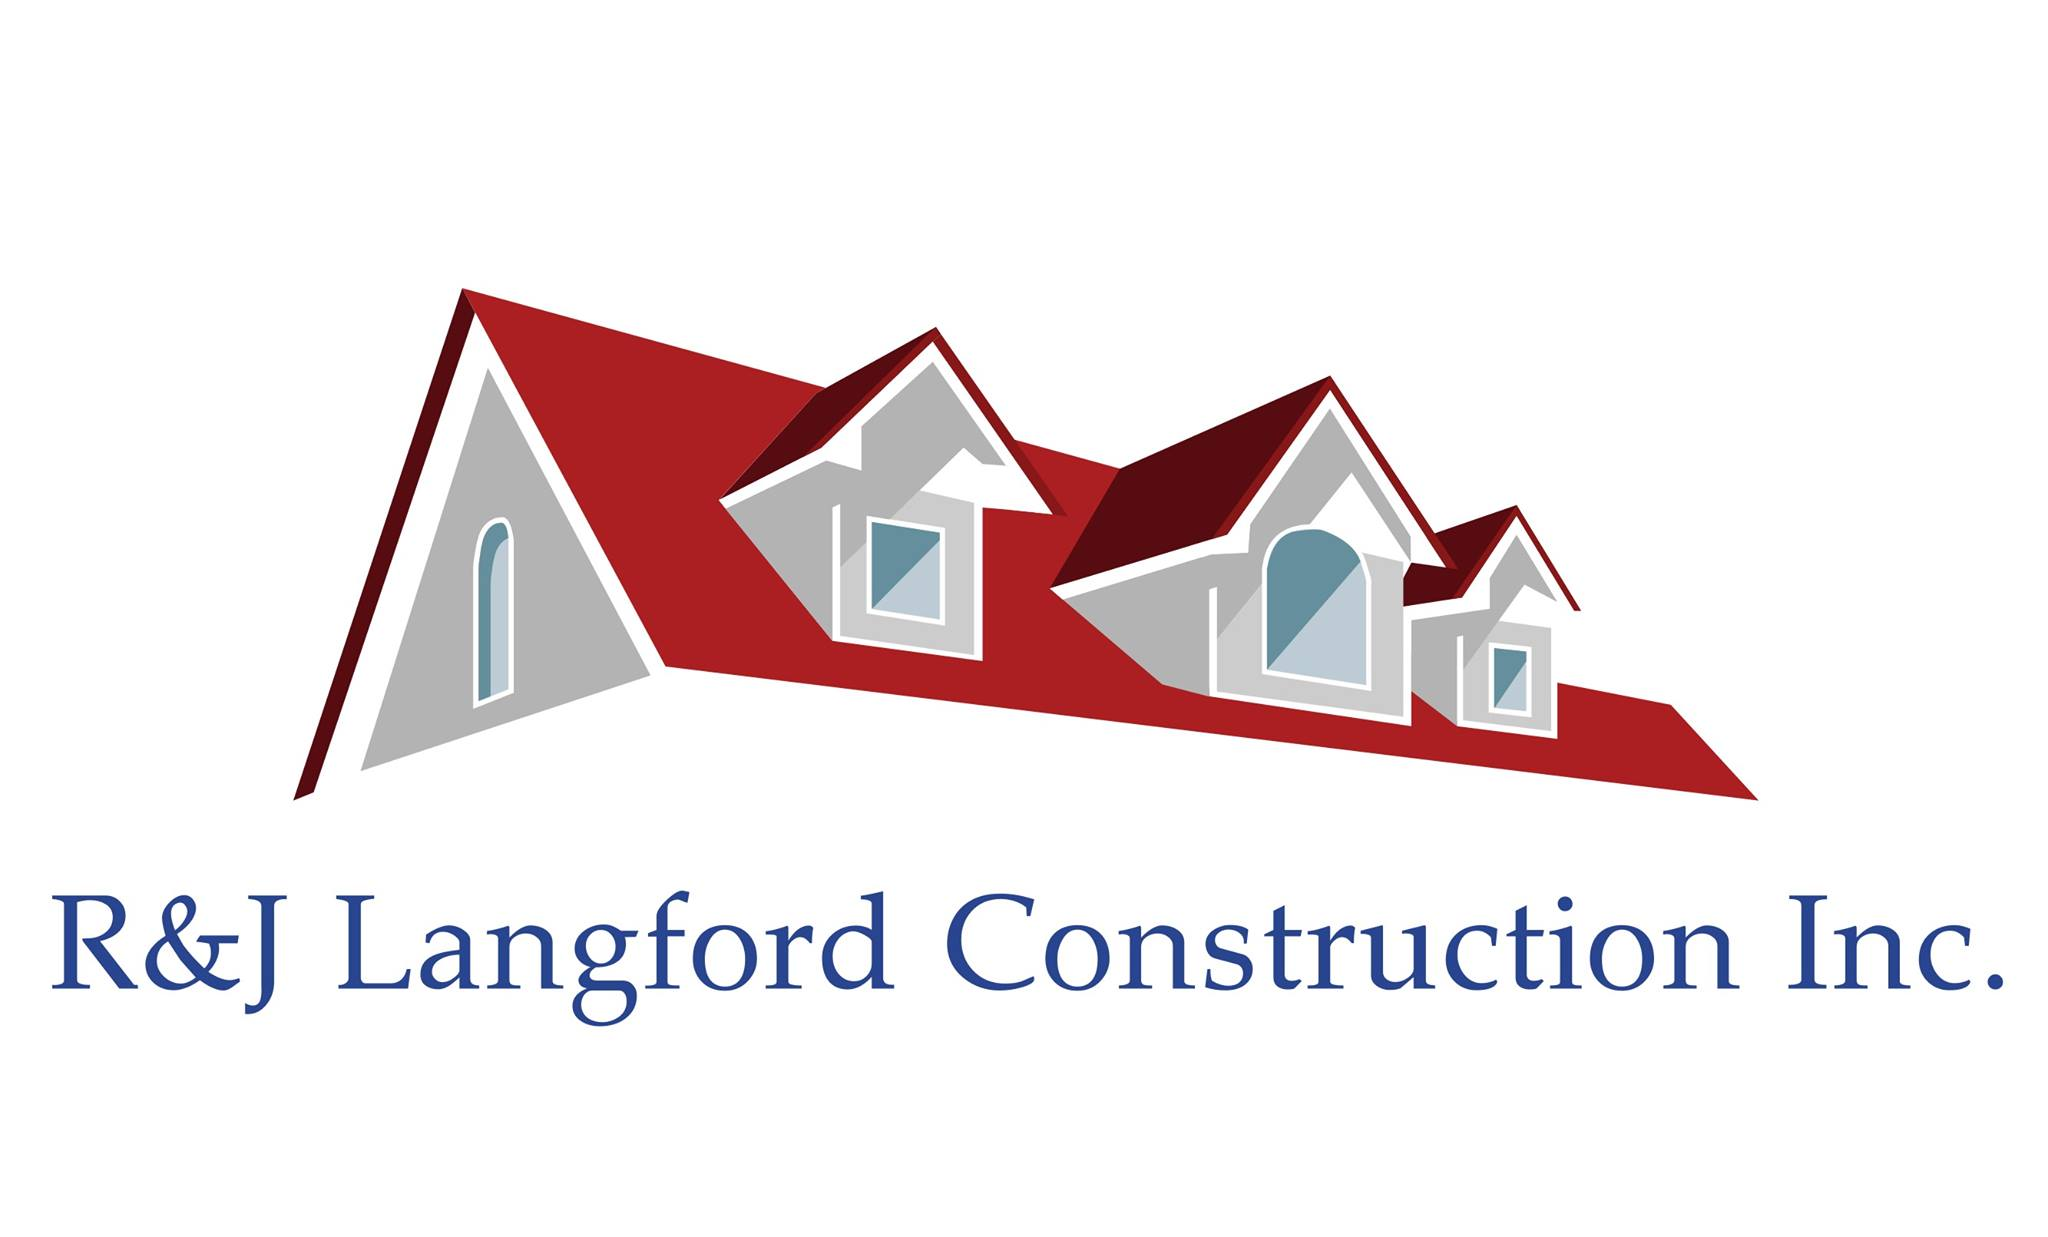 R&J Langford Construction, Inc.